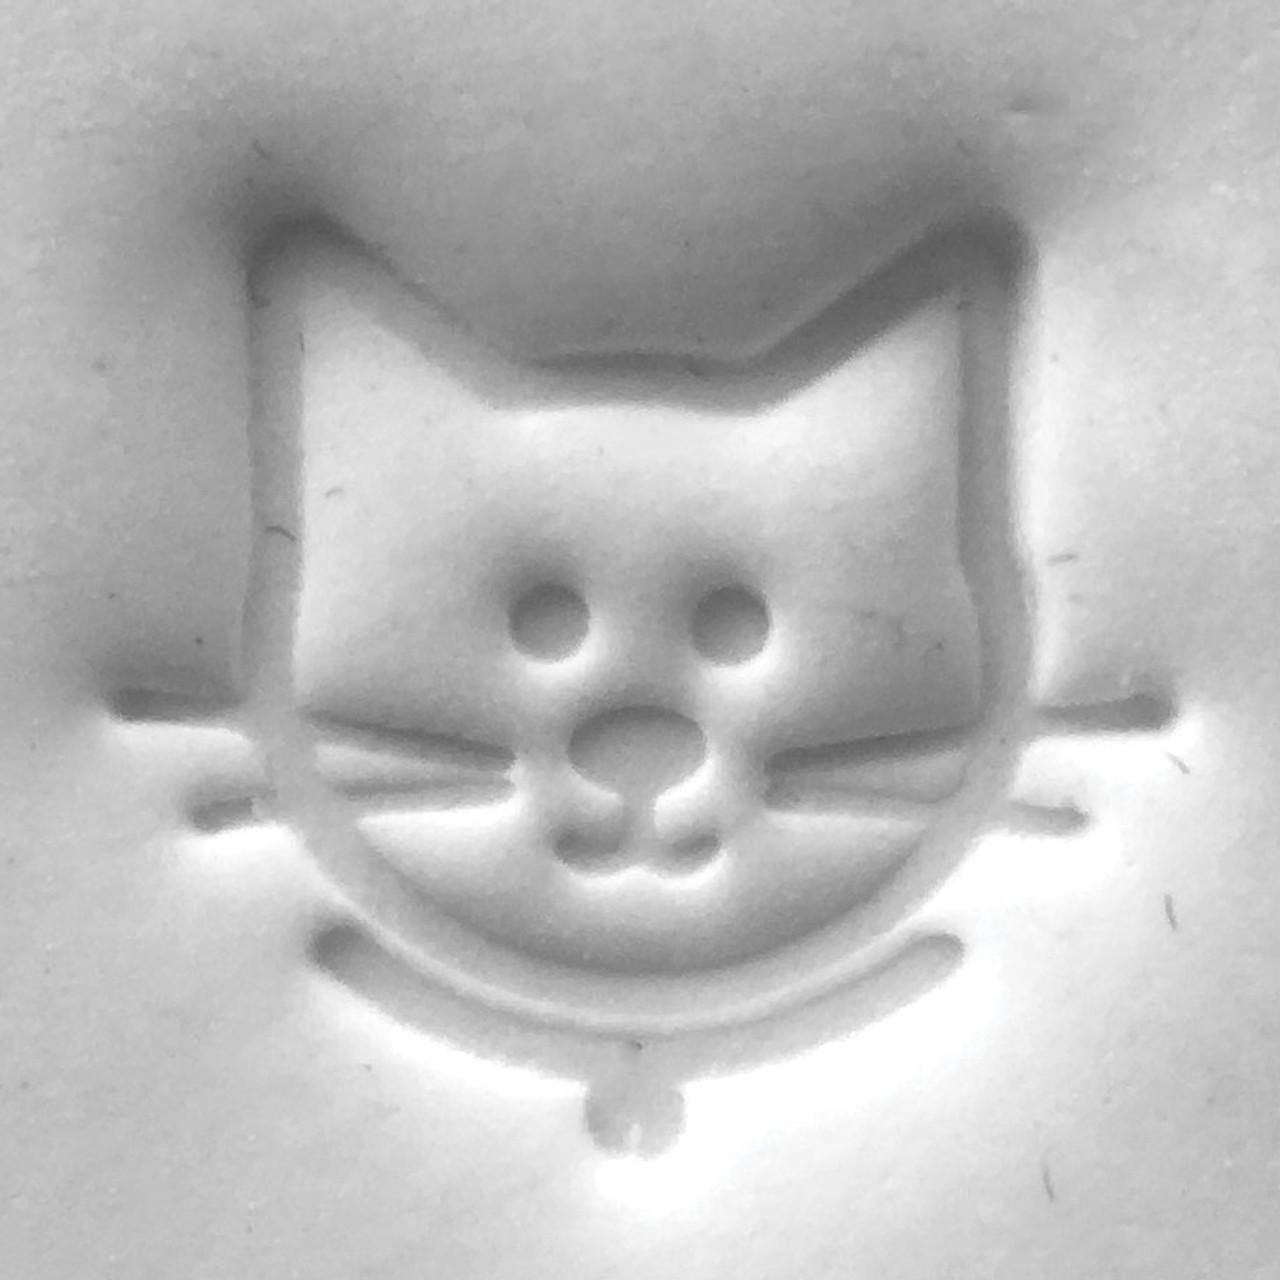 SCAT - Cat Shaped Stamp